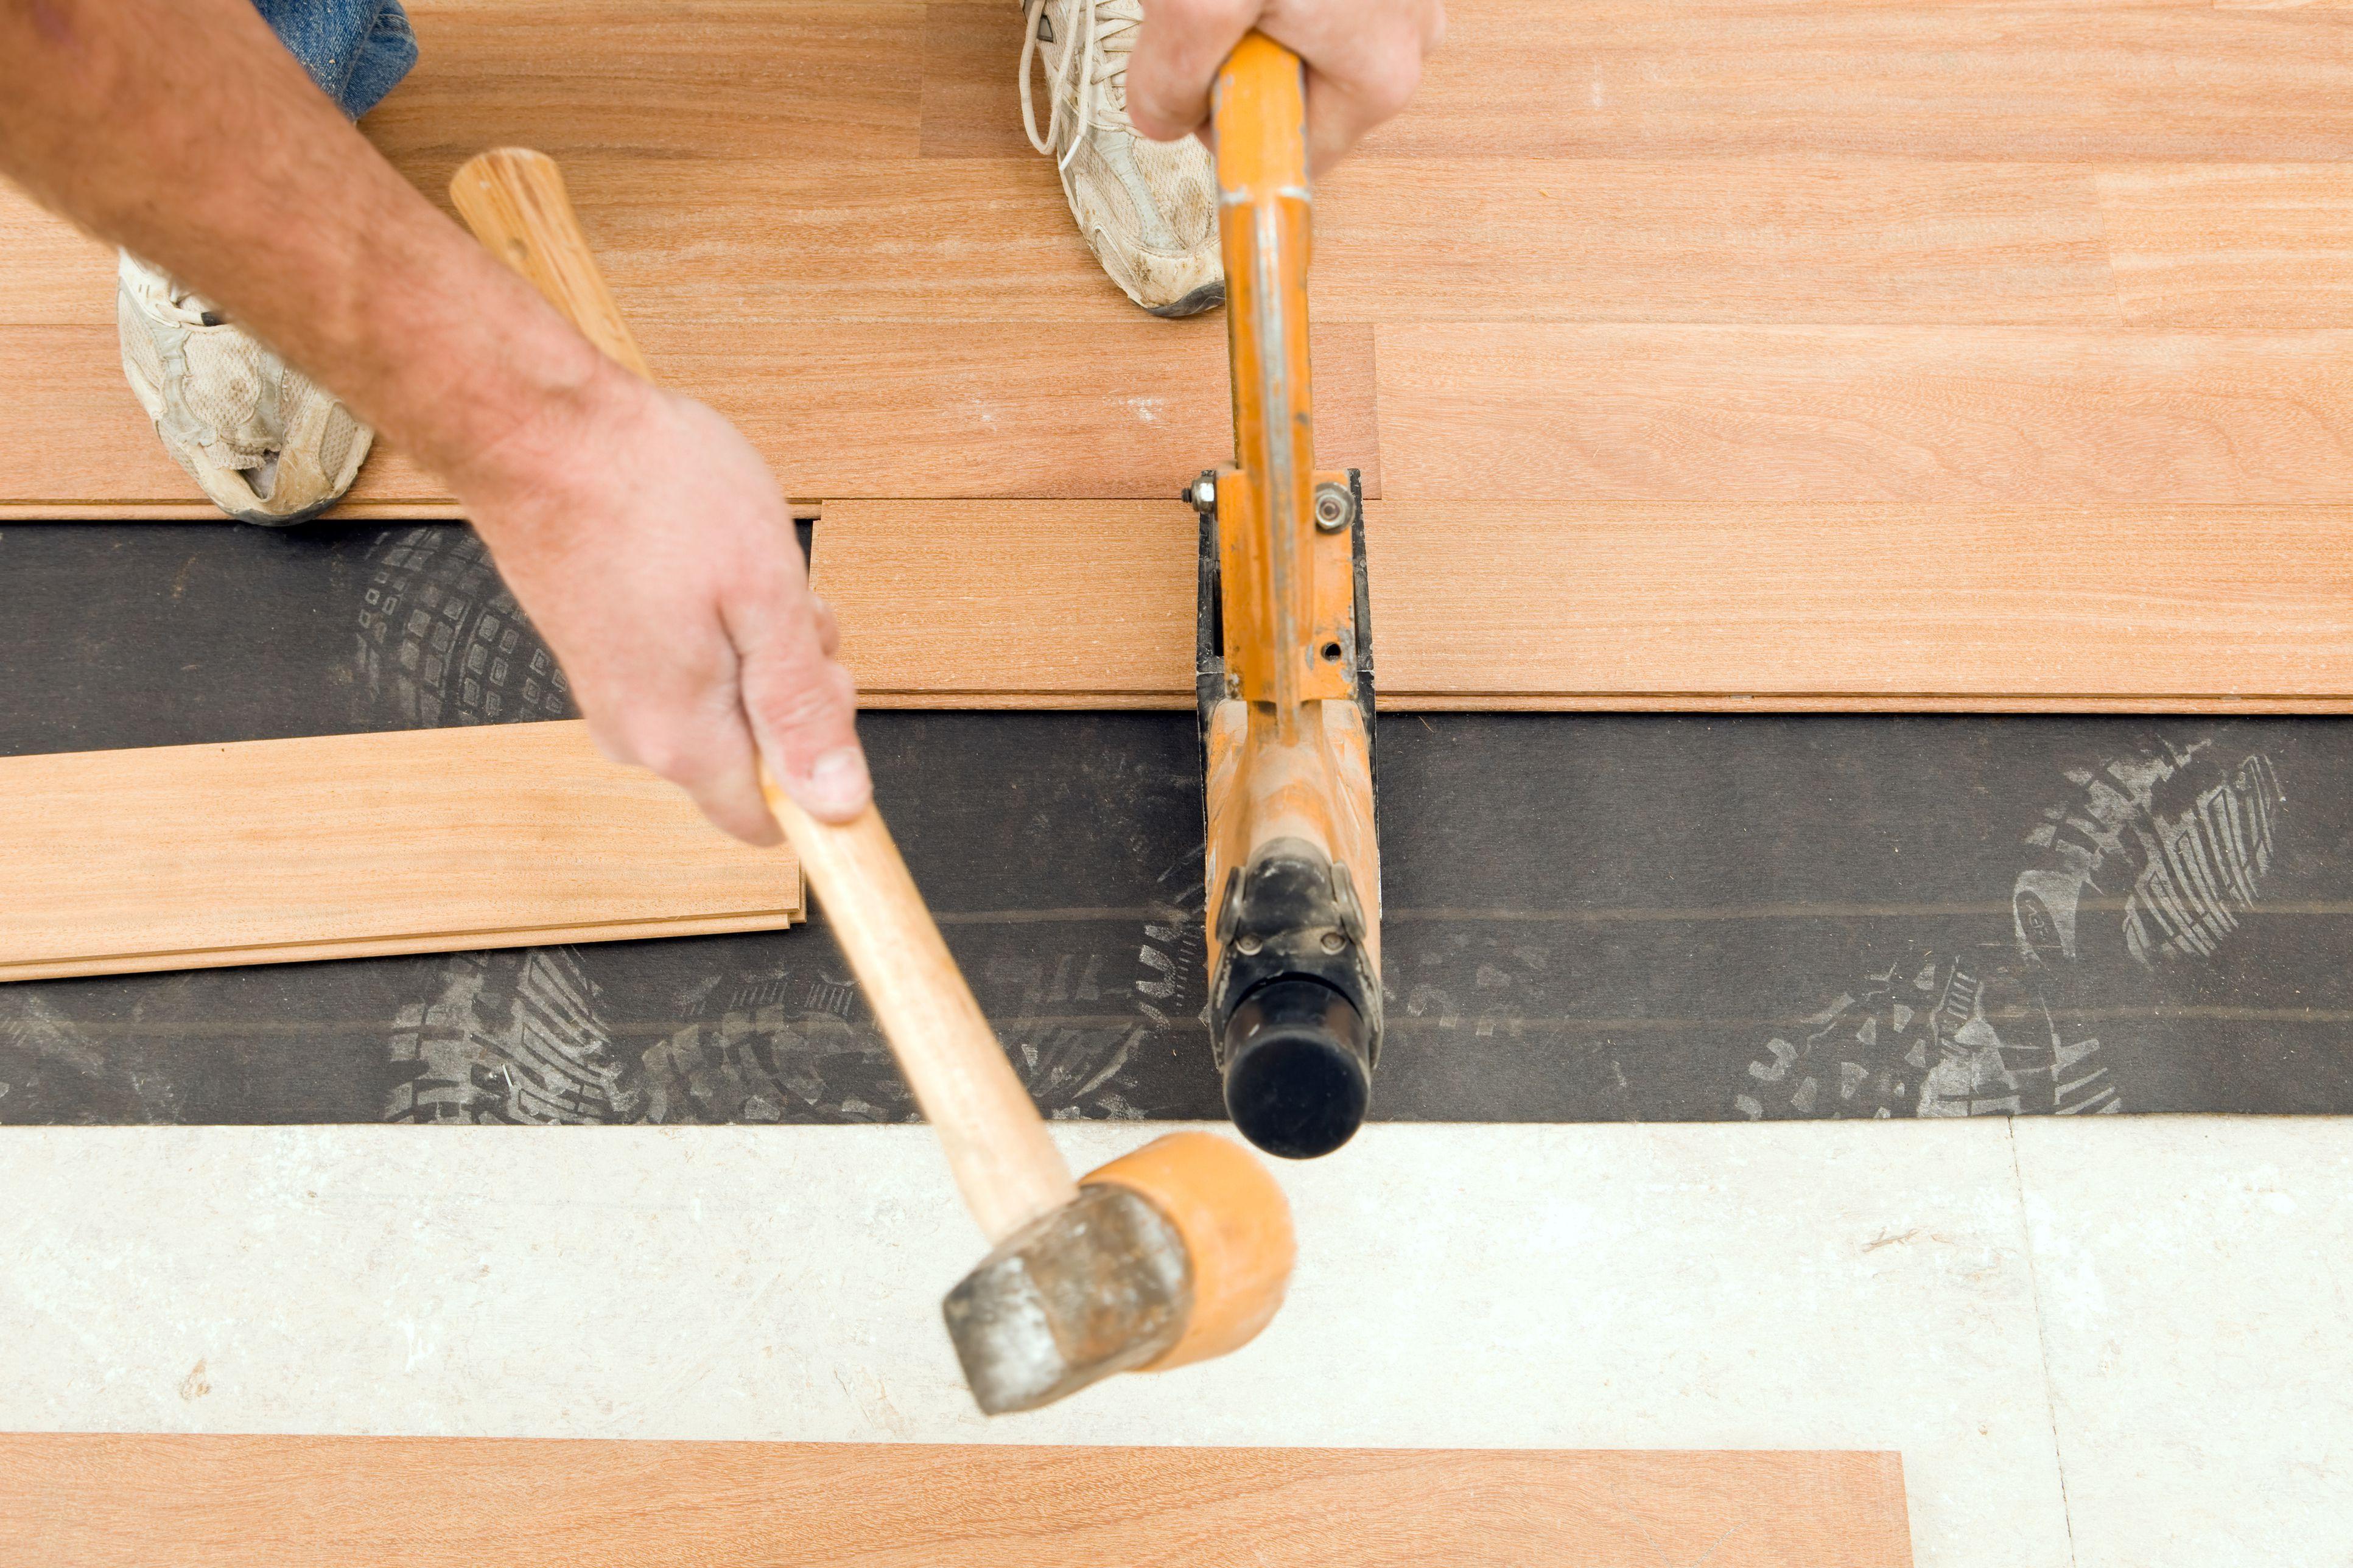 5 inch red oak hardwood flooring of the hardest wood flooring you can buy pertaining to worker installing new cumuru hardwood floor 186852280 5827f3bc5f9b58d5b11372fc